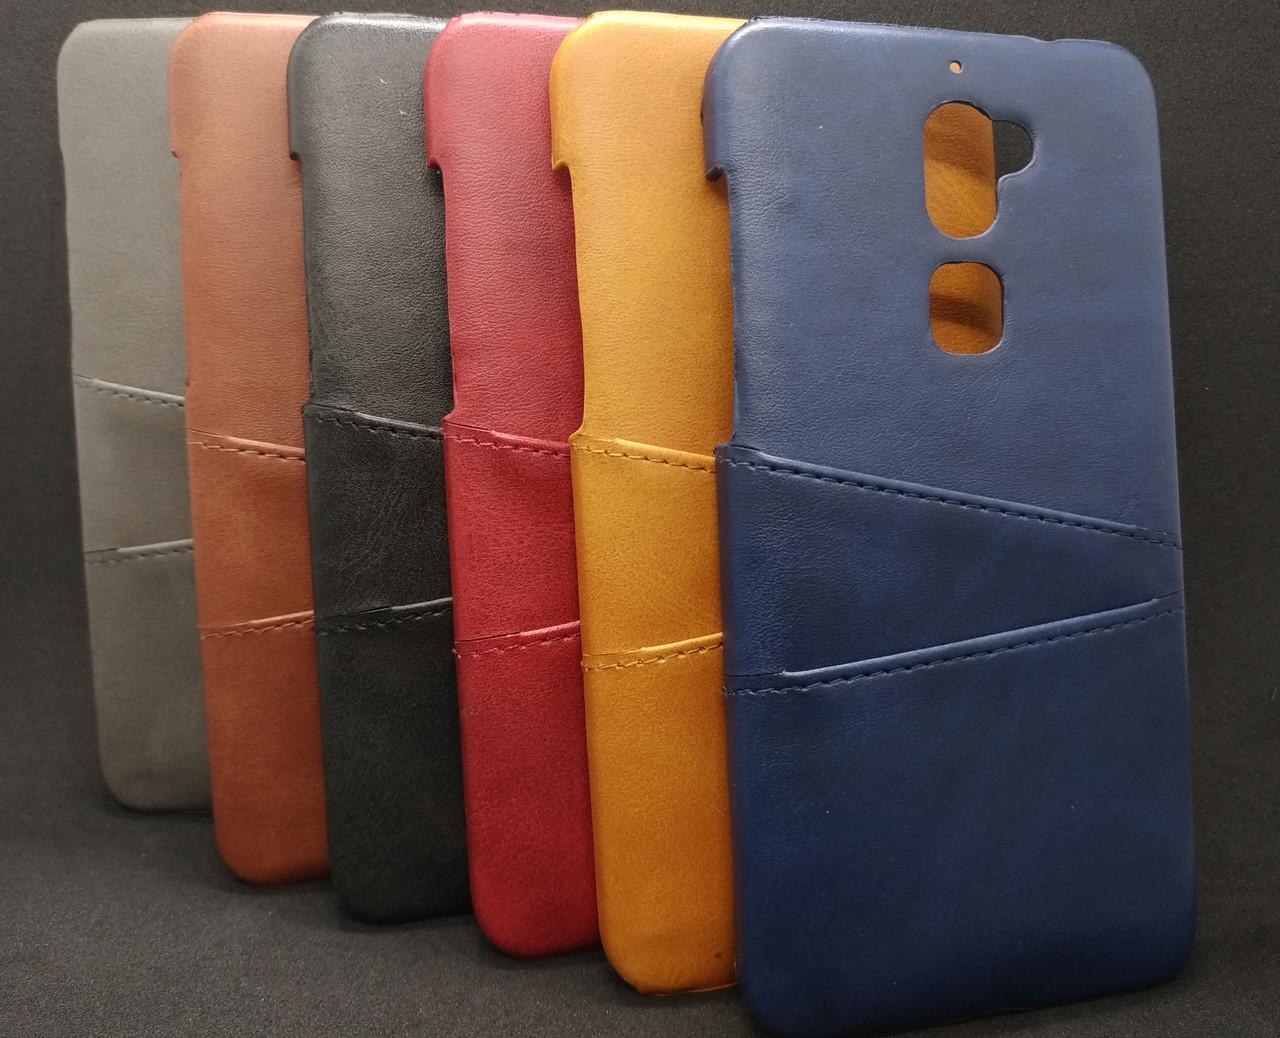 Кожаный чехол накладка с карманами для LeEco Cool1 / LeRee Le3 / Coolpad / Cooldual / Cool Play 6 / Changer 1C